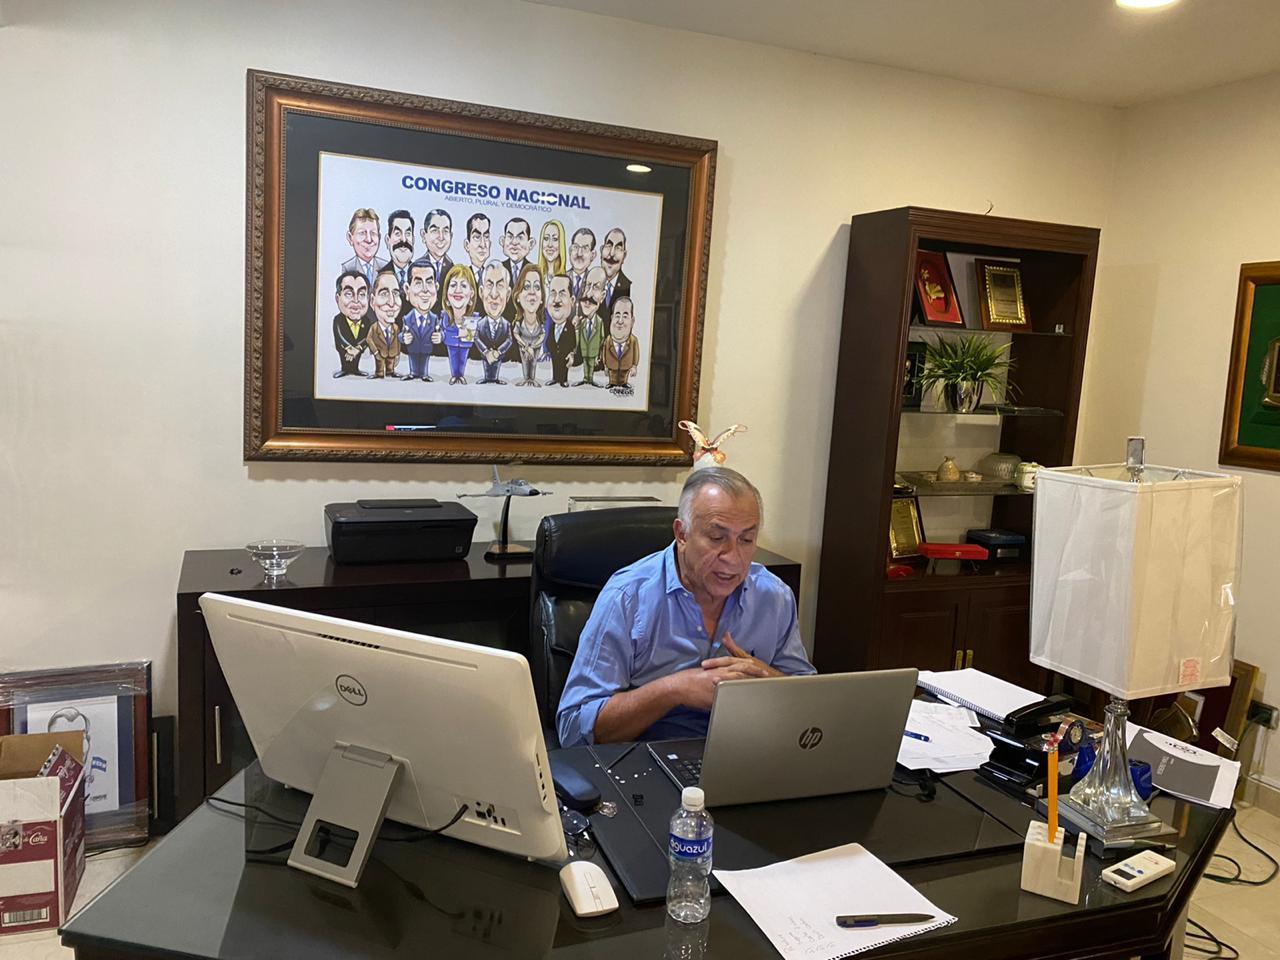 Congreso Nacional convoca a reunión virtual para el próximo jueves